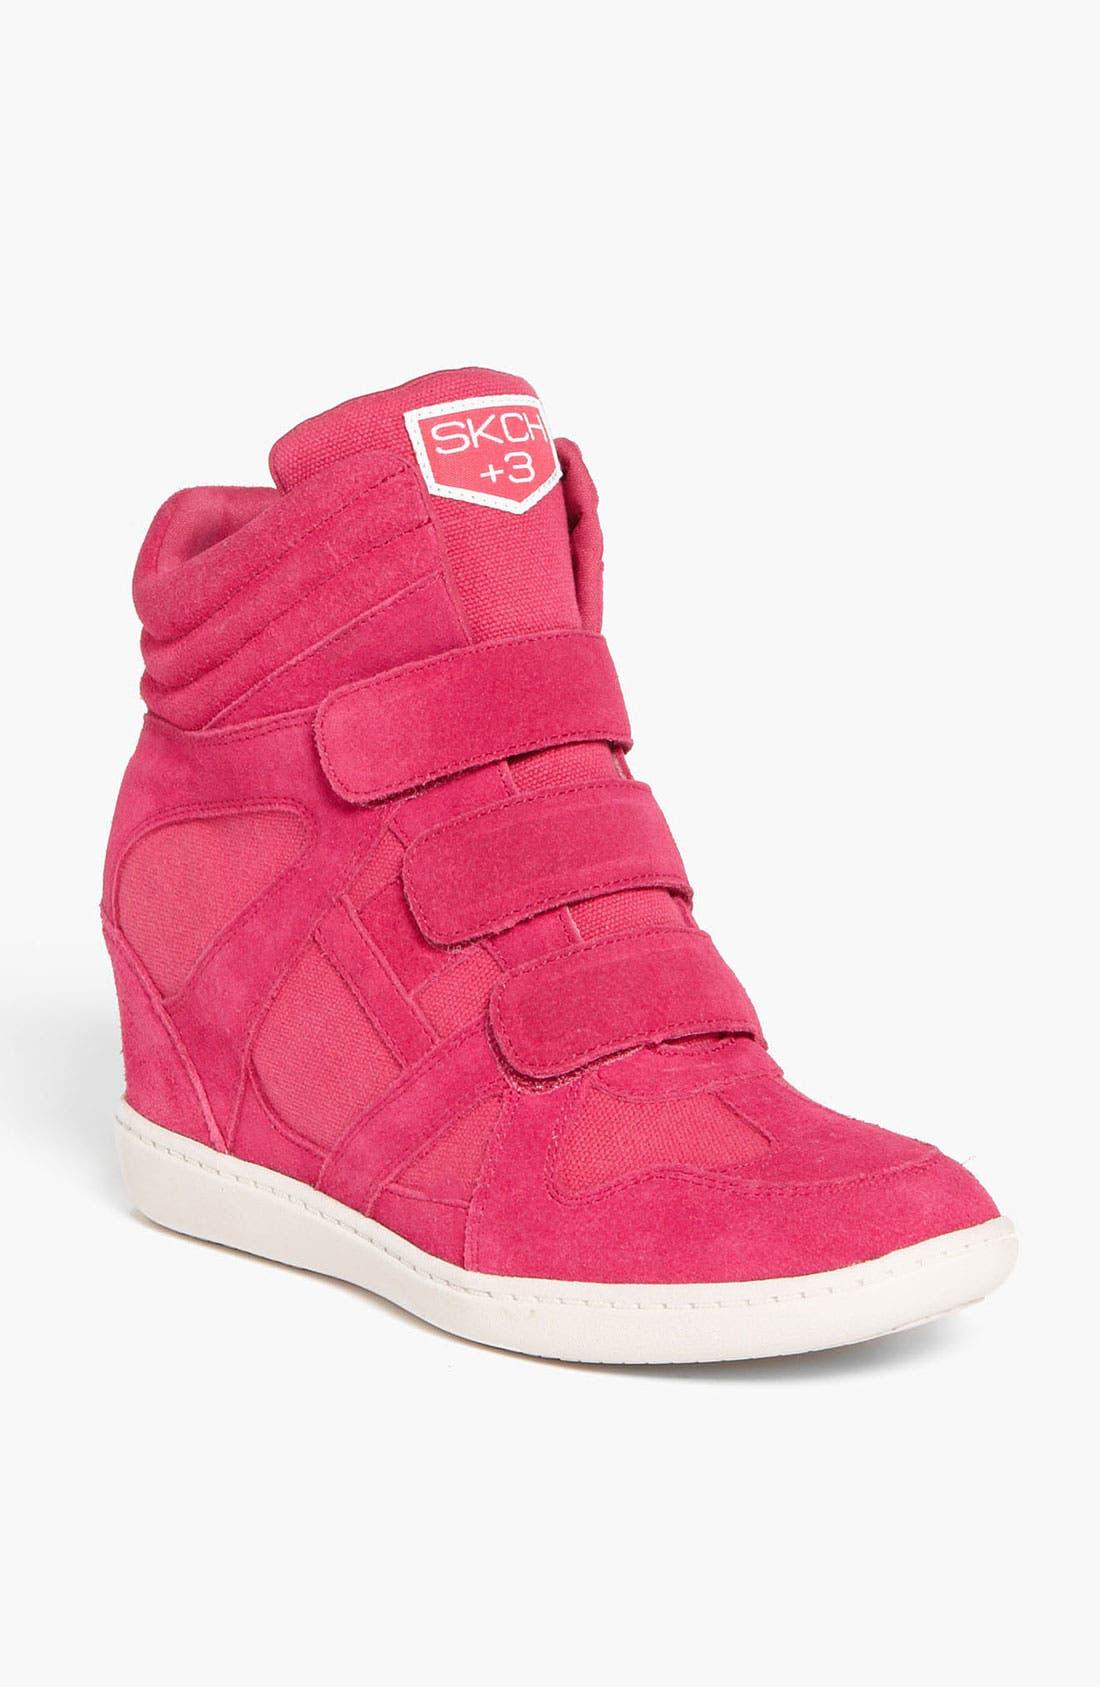 Main Image - SKECHERS 'Plus 3 Raise the Bar' Wedge Sneaker (Women)